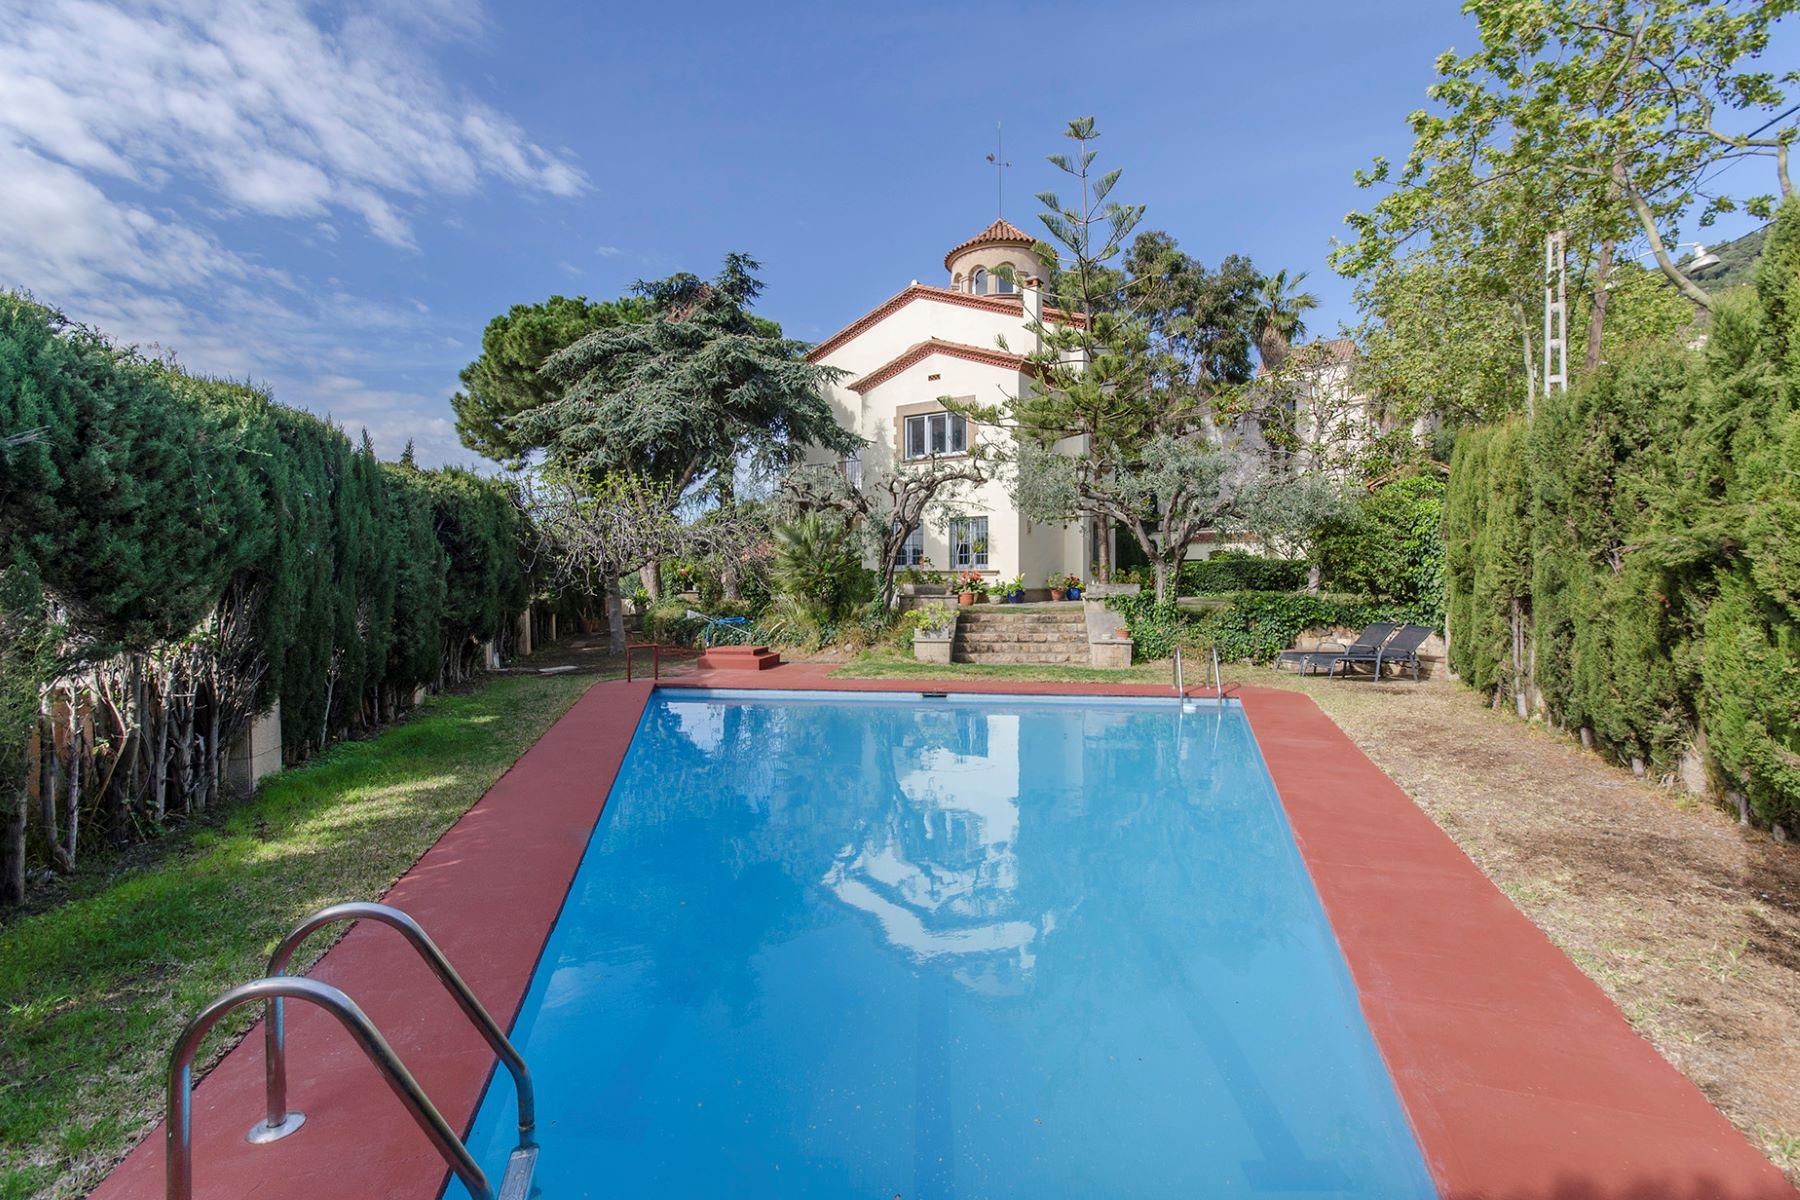 Single Family Home for Sale at Fantastic detached house with pool in Avinguda Tibidabo Barcelona City, Barcelona 08034 Spain